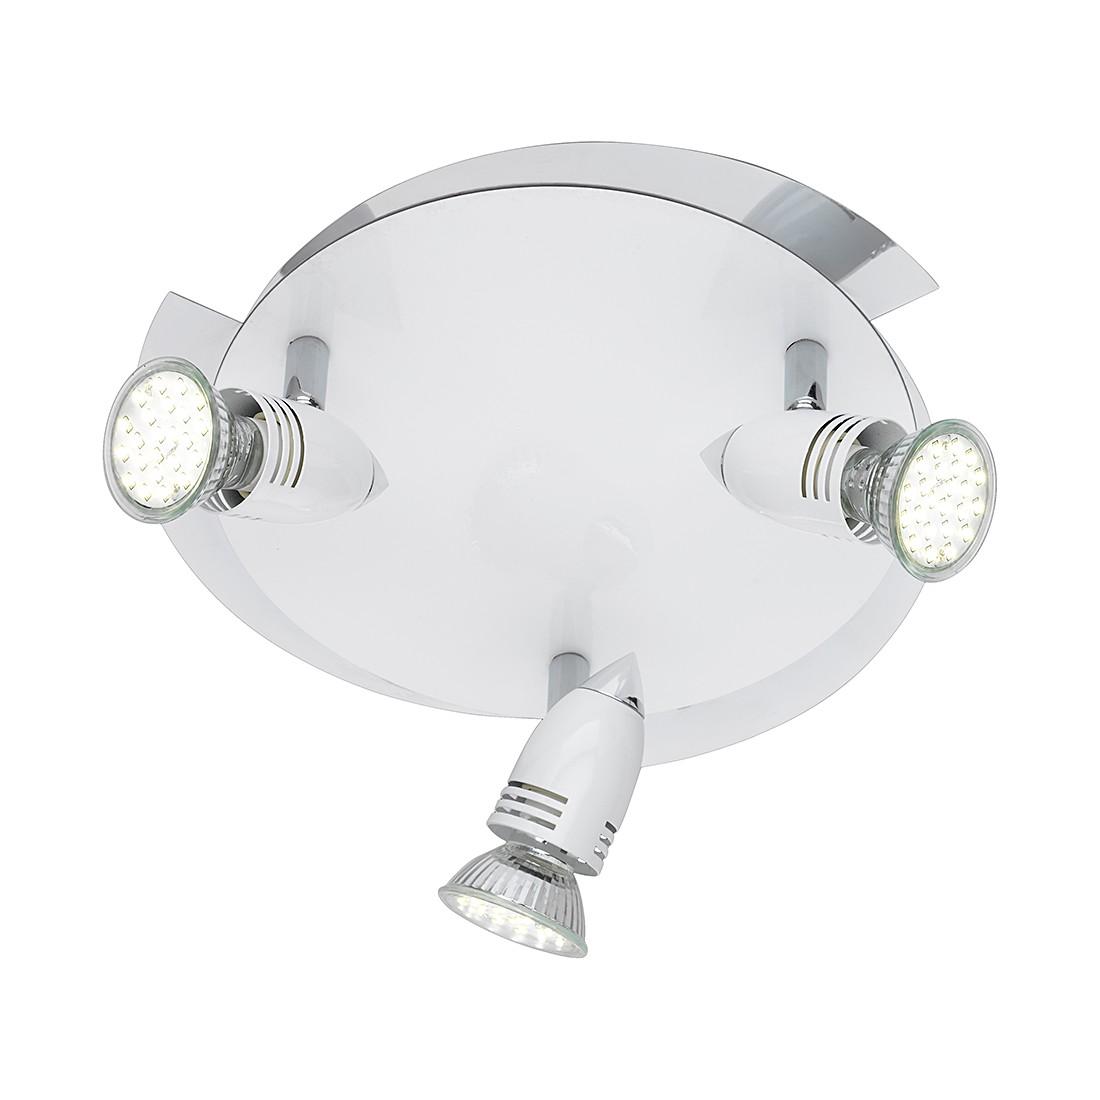 LED-Rondell - 3-flammig, Trio